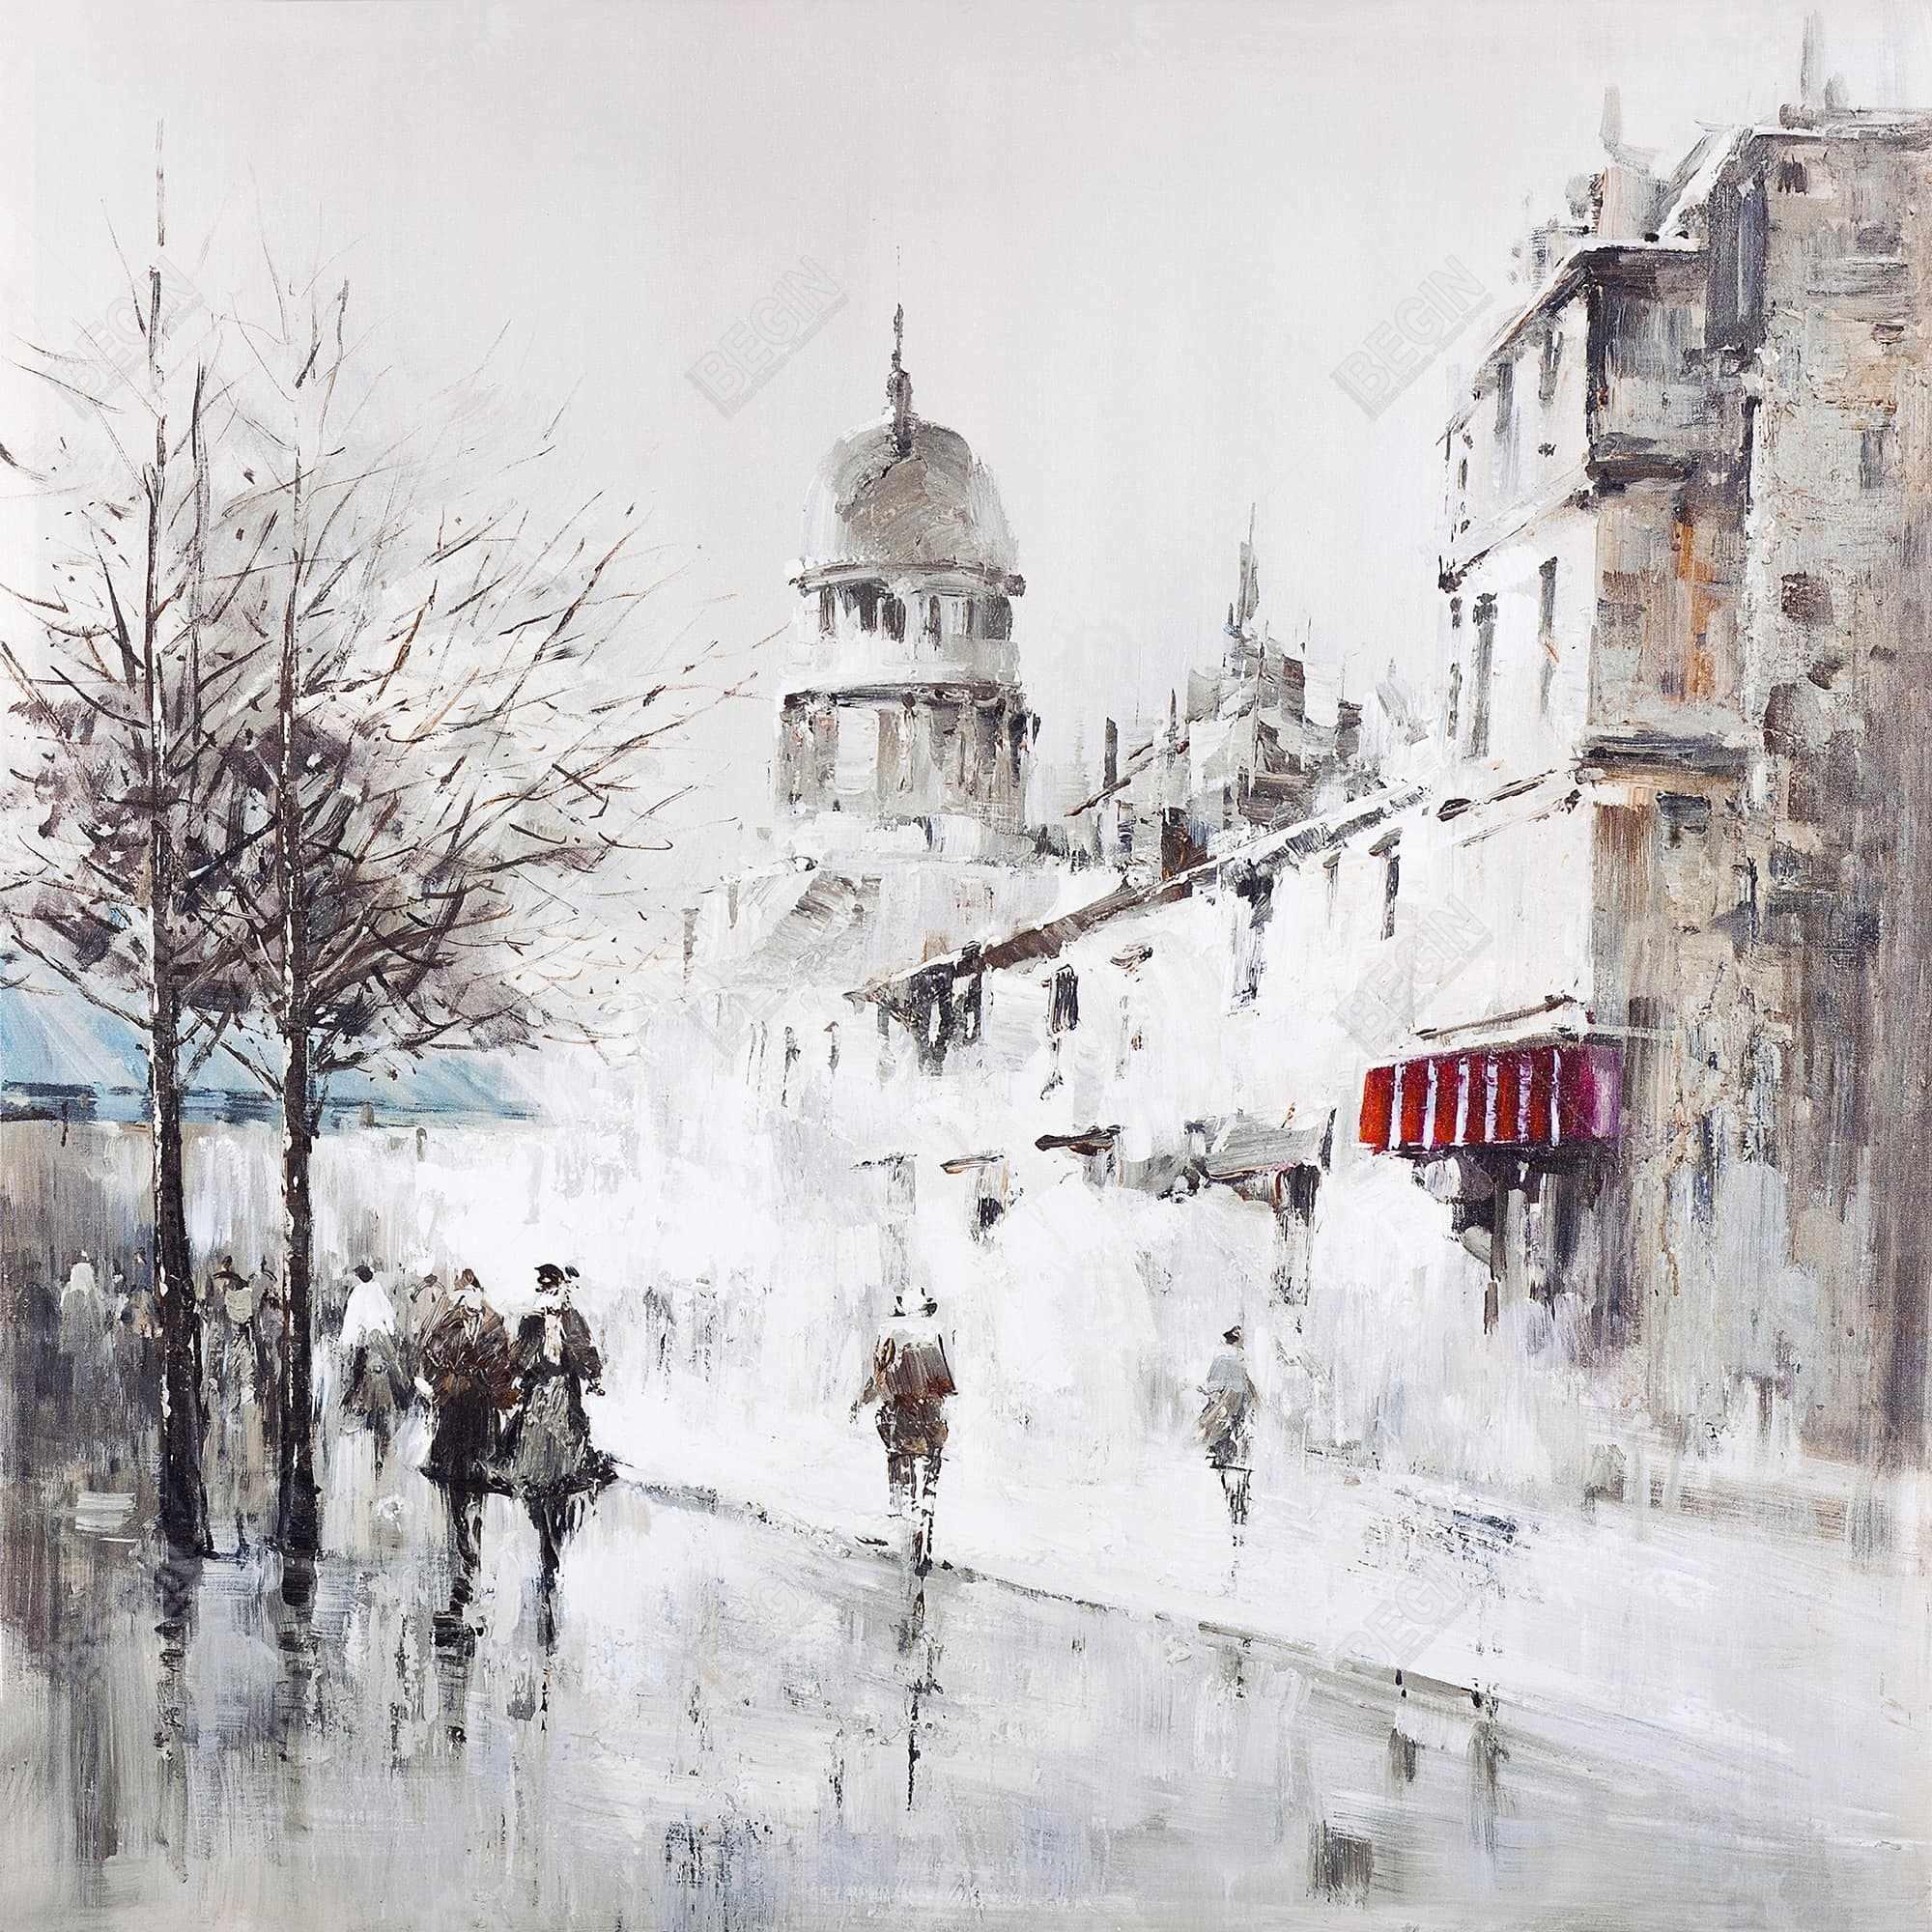 Gray city street